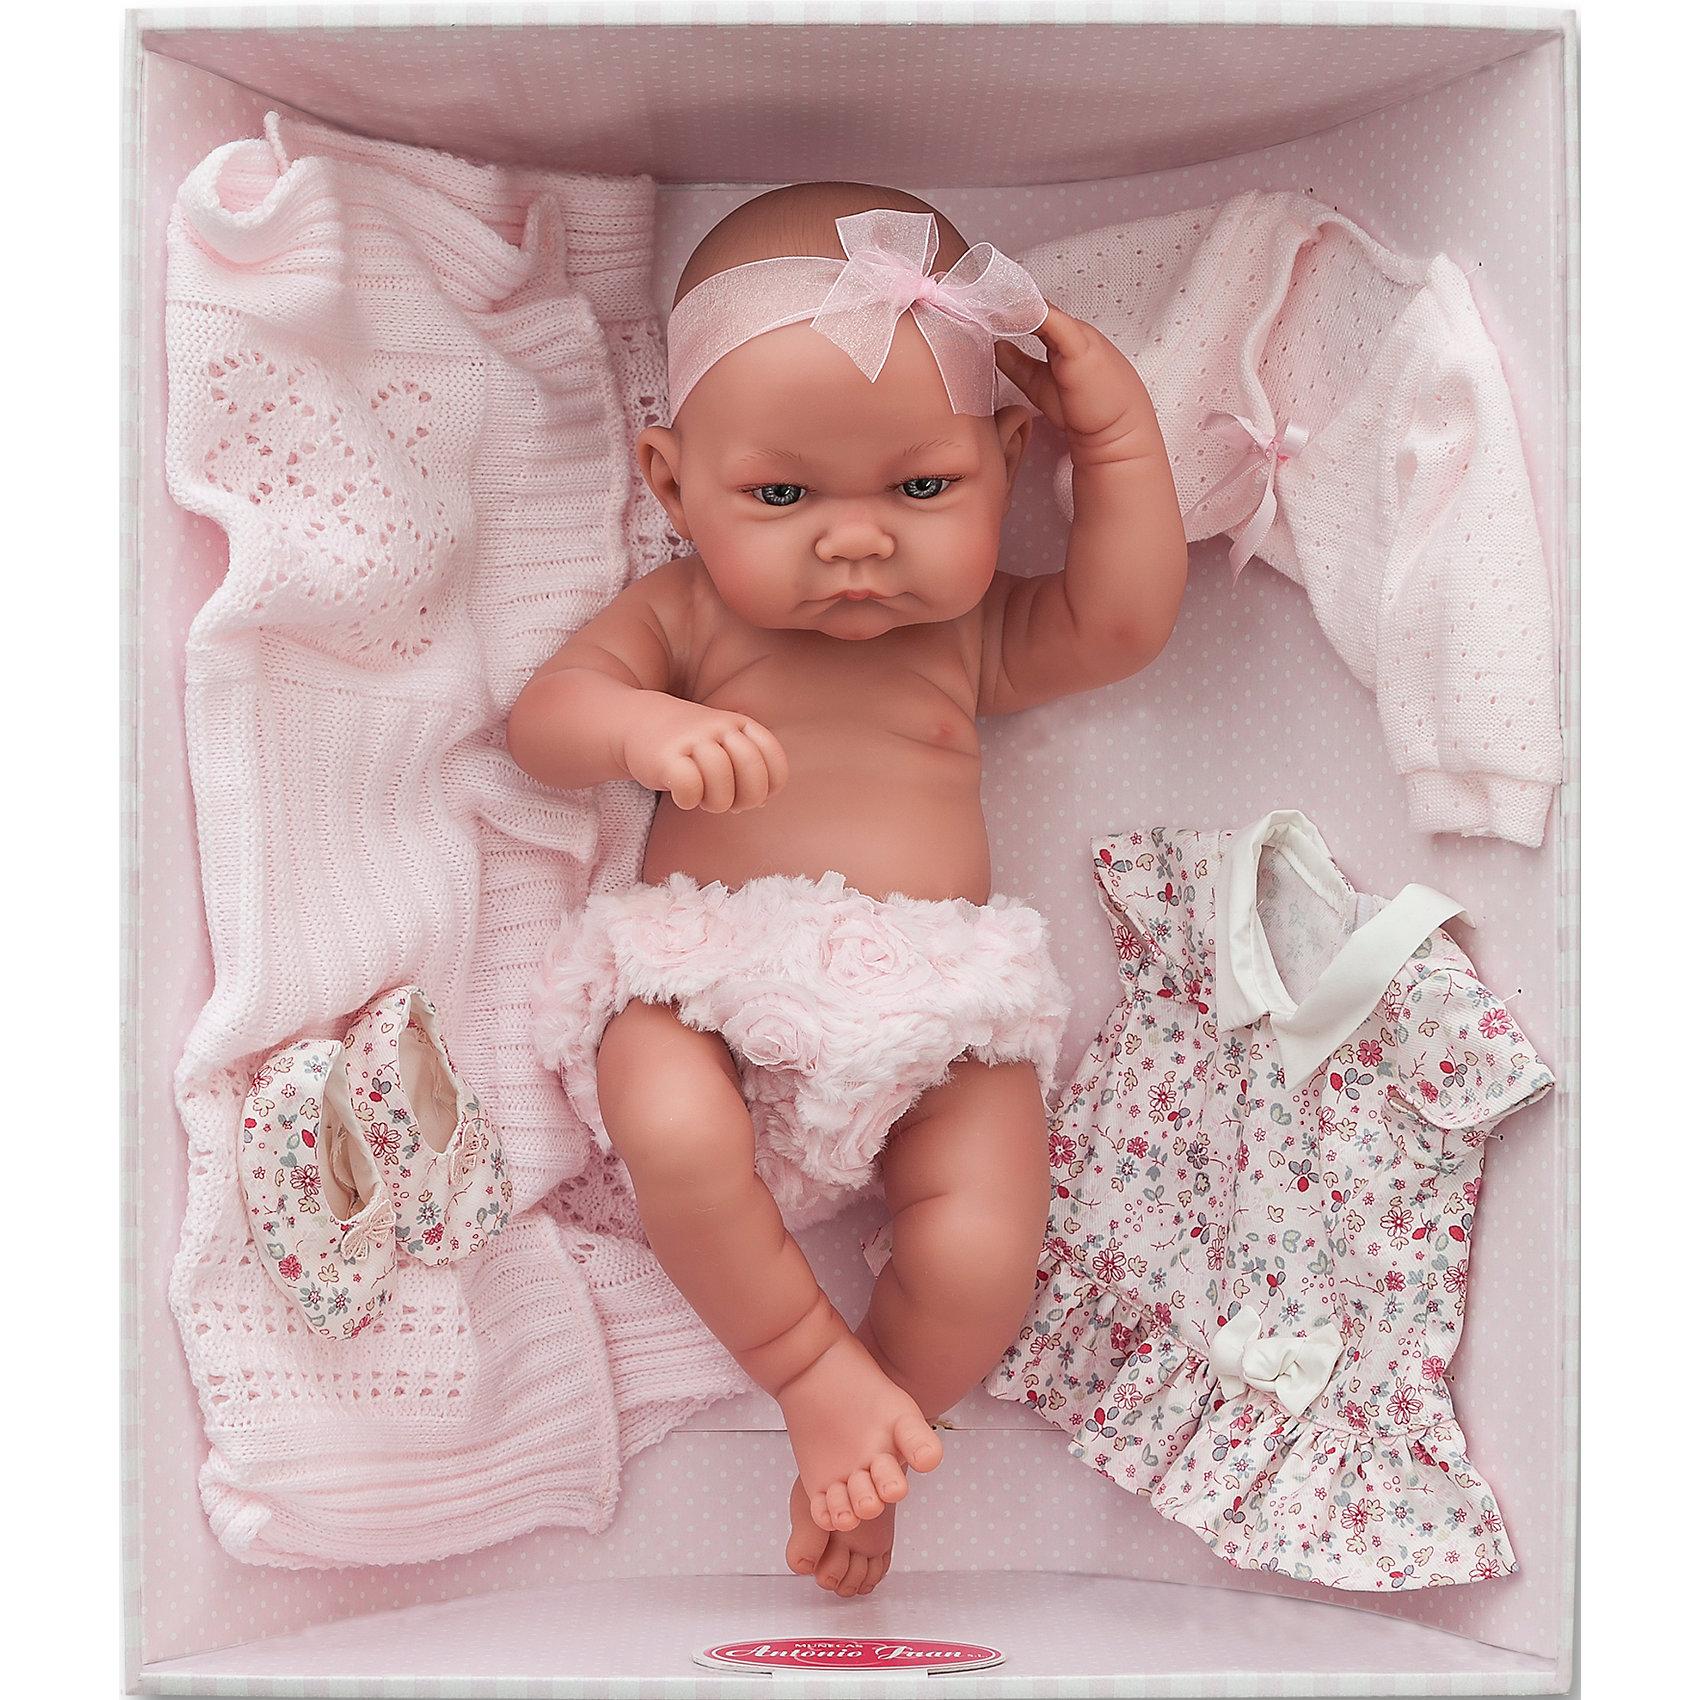 Munecas Antonio Juan Кукла-младенец Эльза, 42 см, Munecas Antonio Juan кукла младенец игнасио в голубом 42 см antonio juan munecas